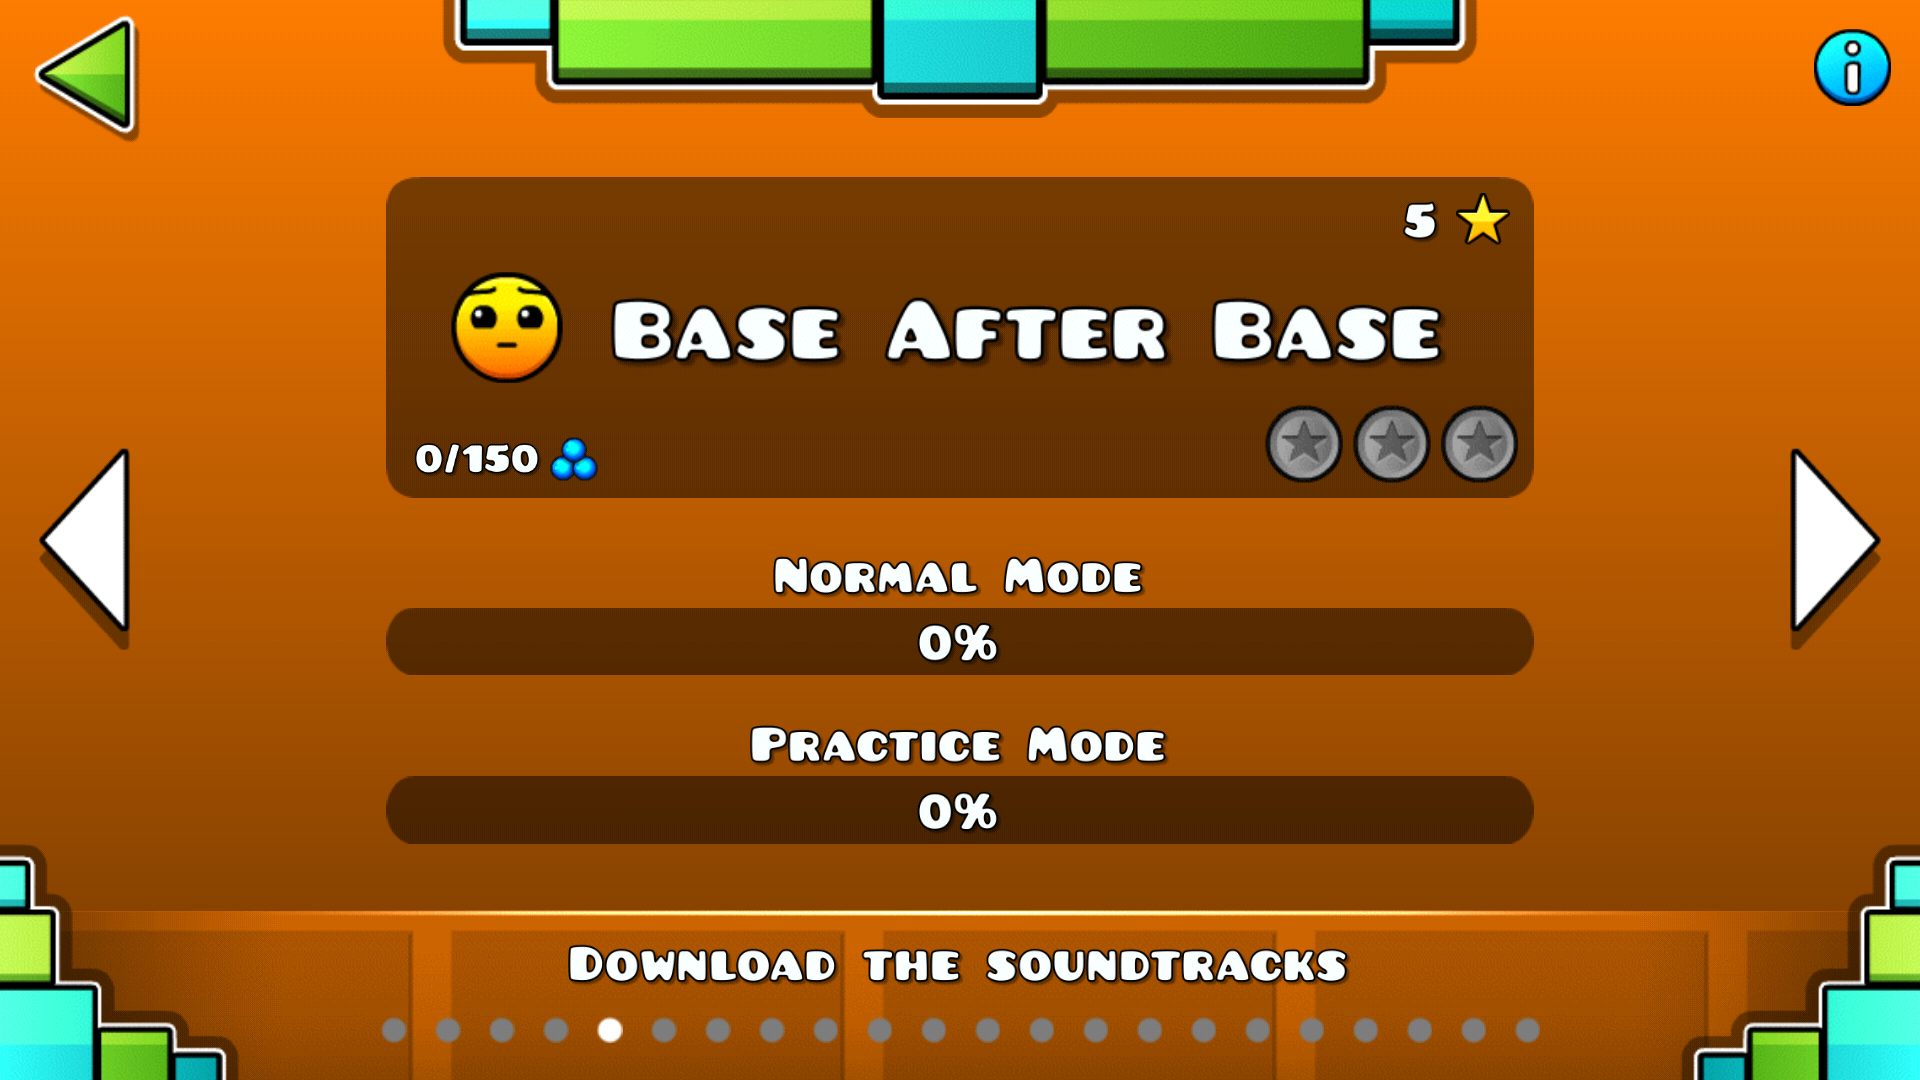 BaseAfterBaseMenu.png